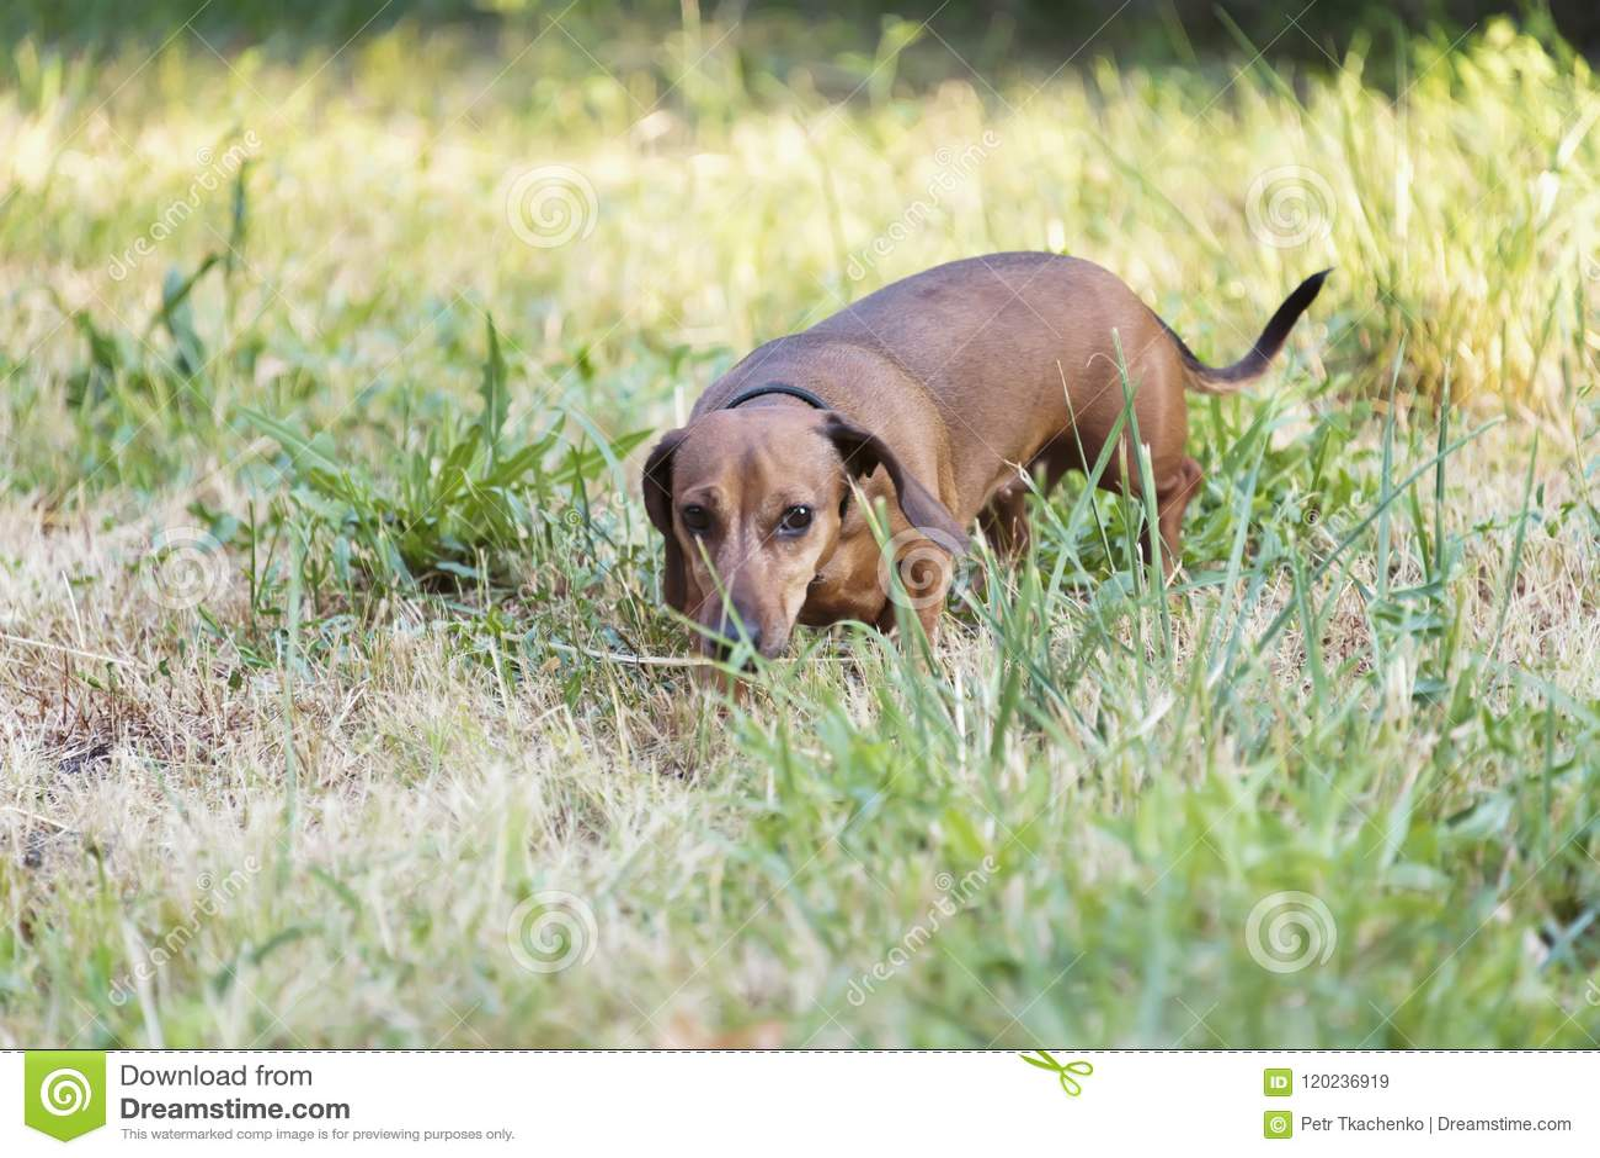 Een jachthond loopt langs de grastekkel, Basset